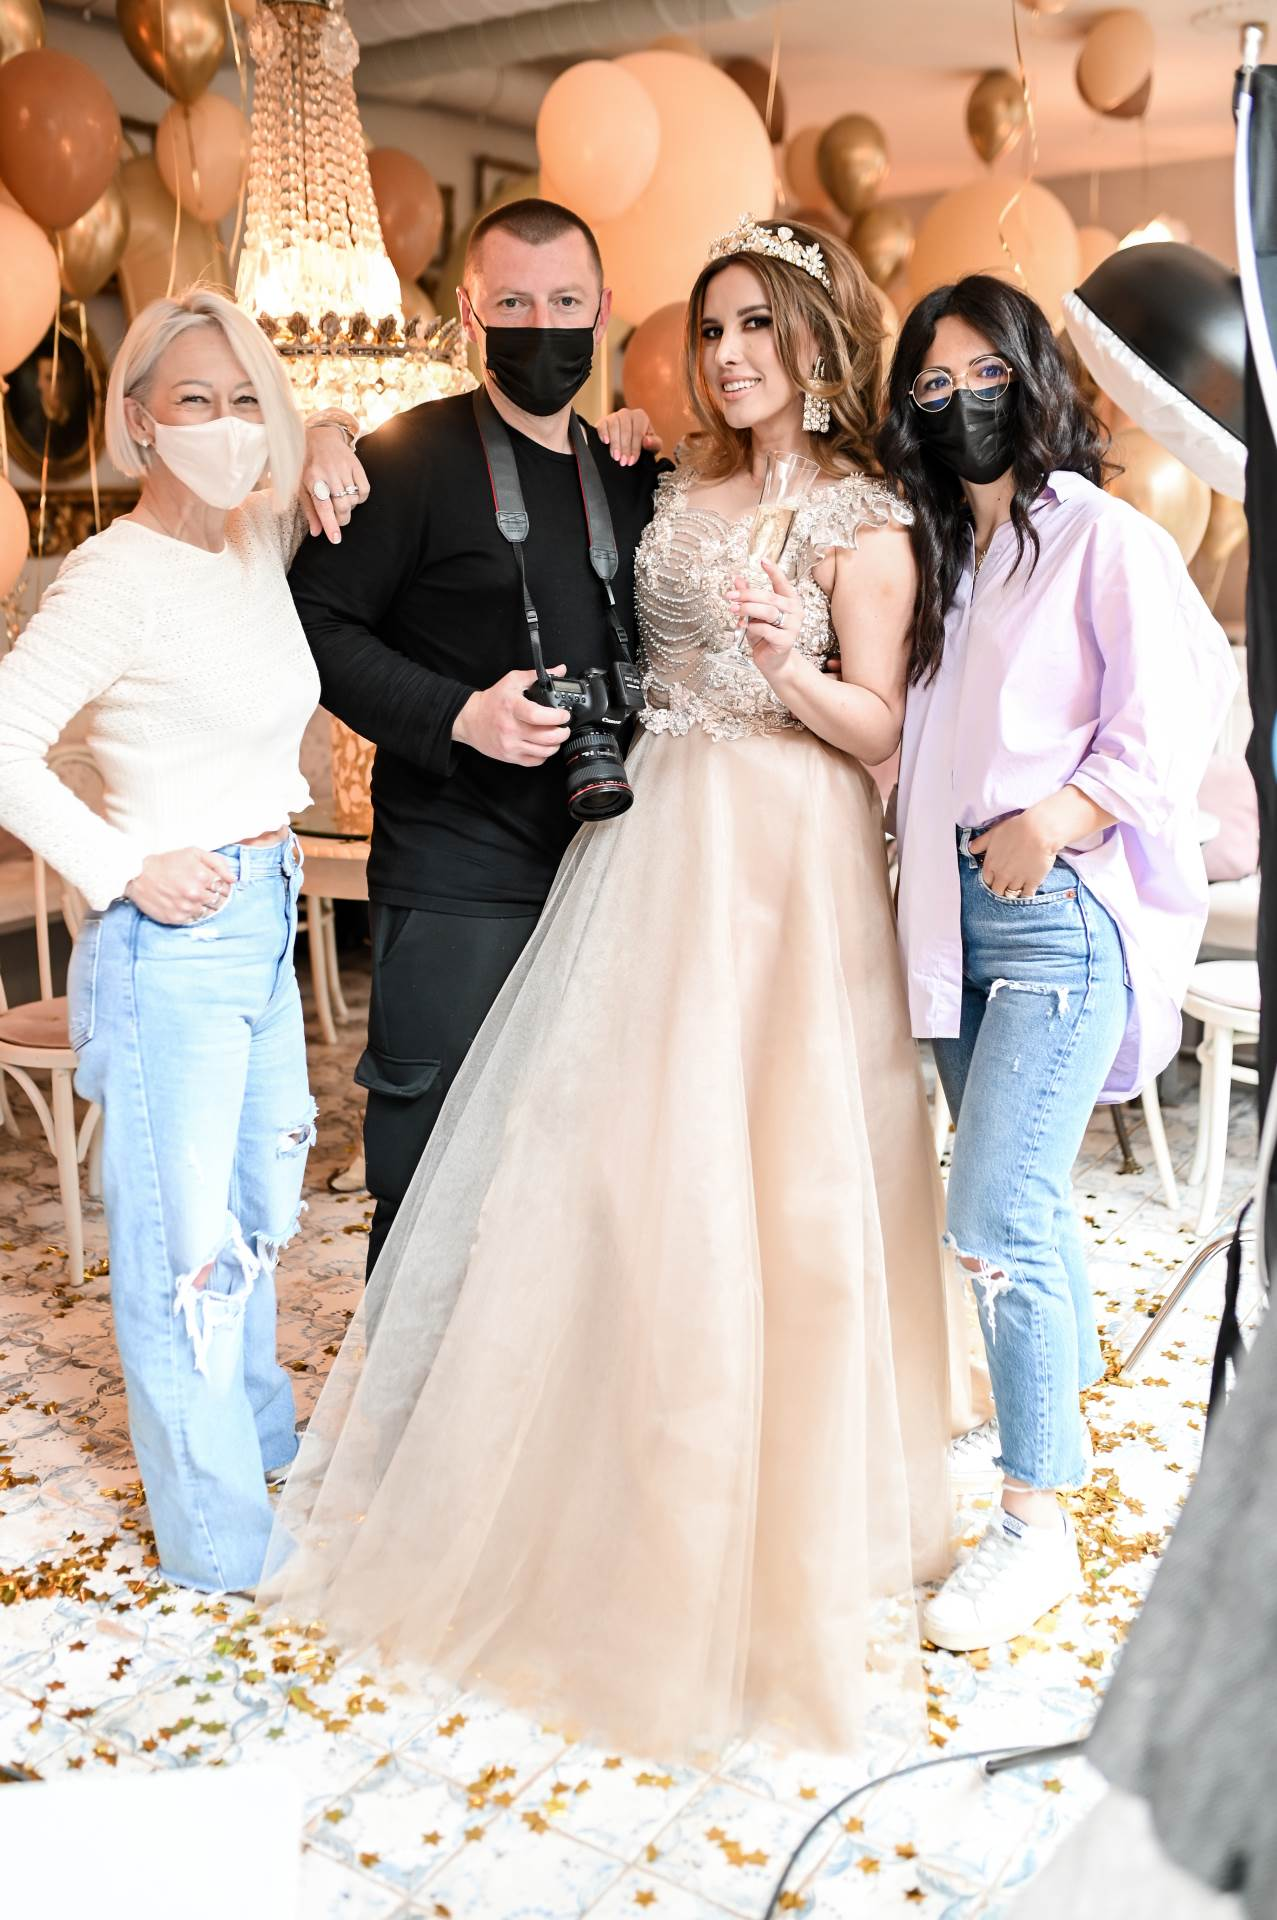 Vizažistica Sanja Agić, fotograf i stilist Goran Čižmešija, Nives Celzijus i Anamarija Uroić iz frizerskog salona Raptur Hair & Beauty